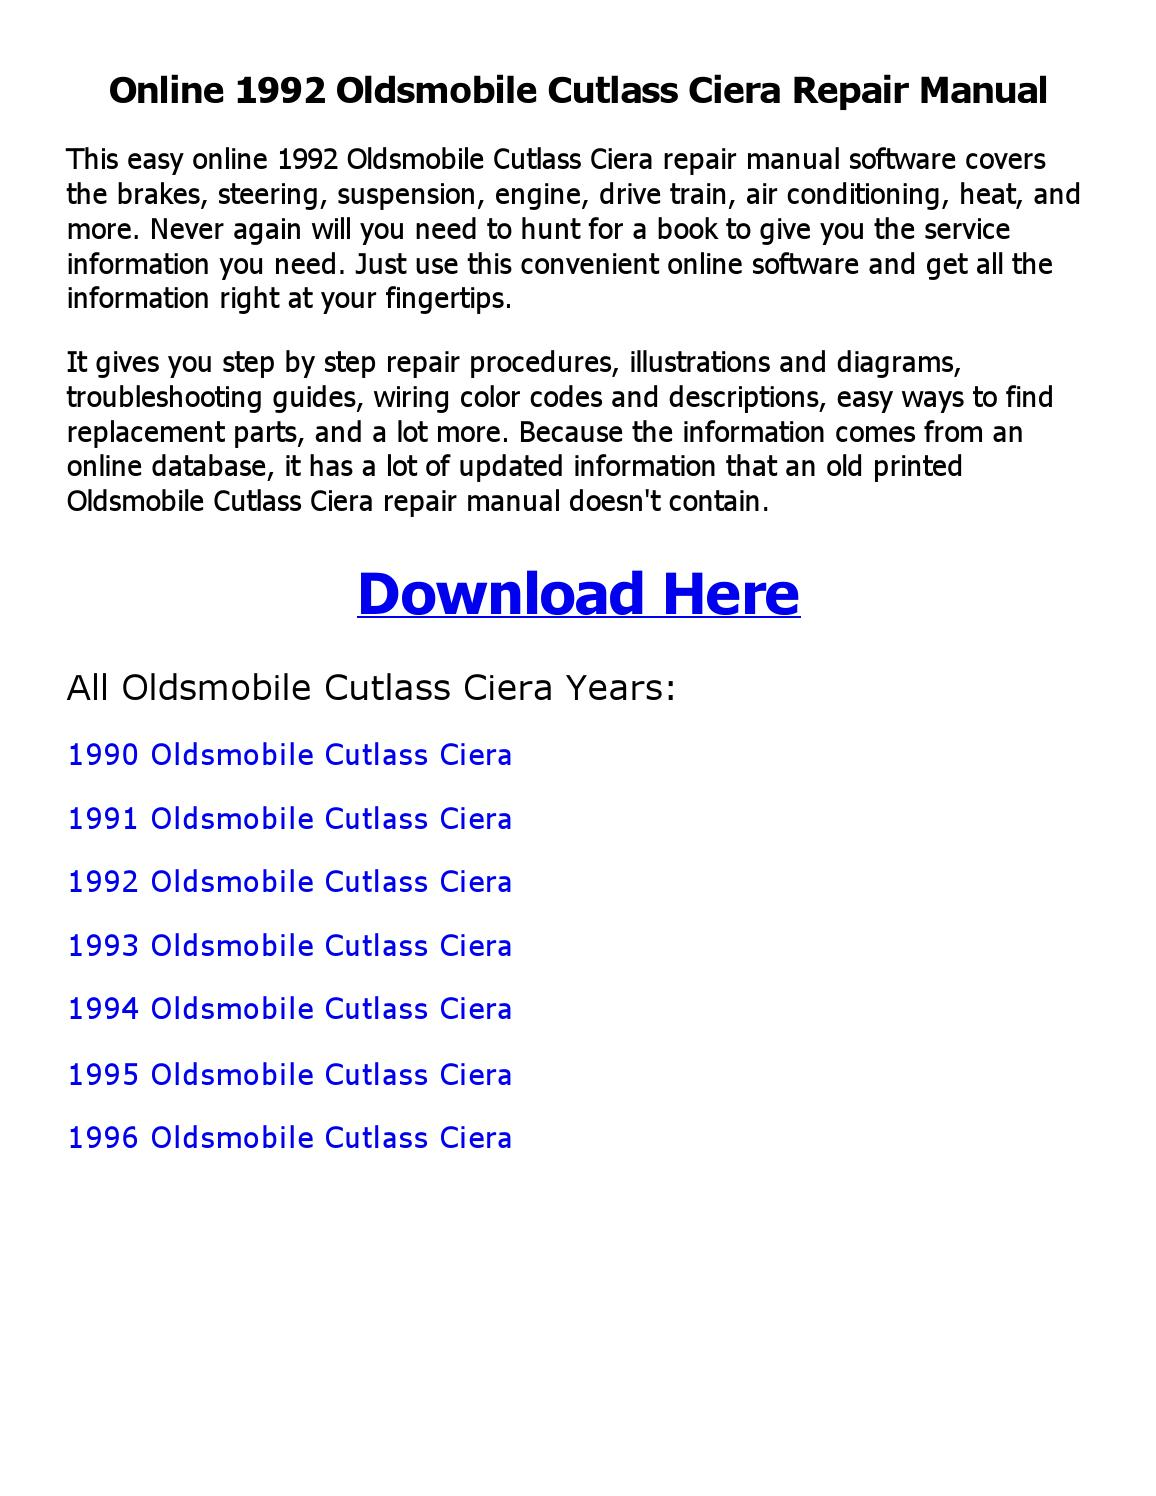 1992 Oldsmobile Cutlass Ciera Repair Manual Online By Jonesalbert012 Issuu